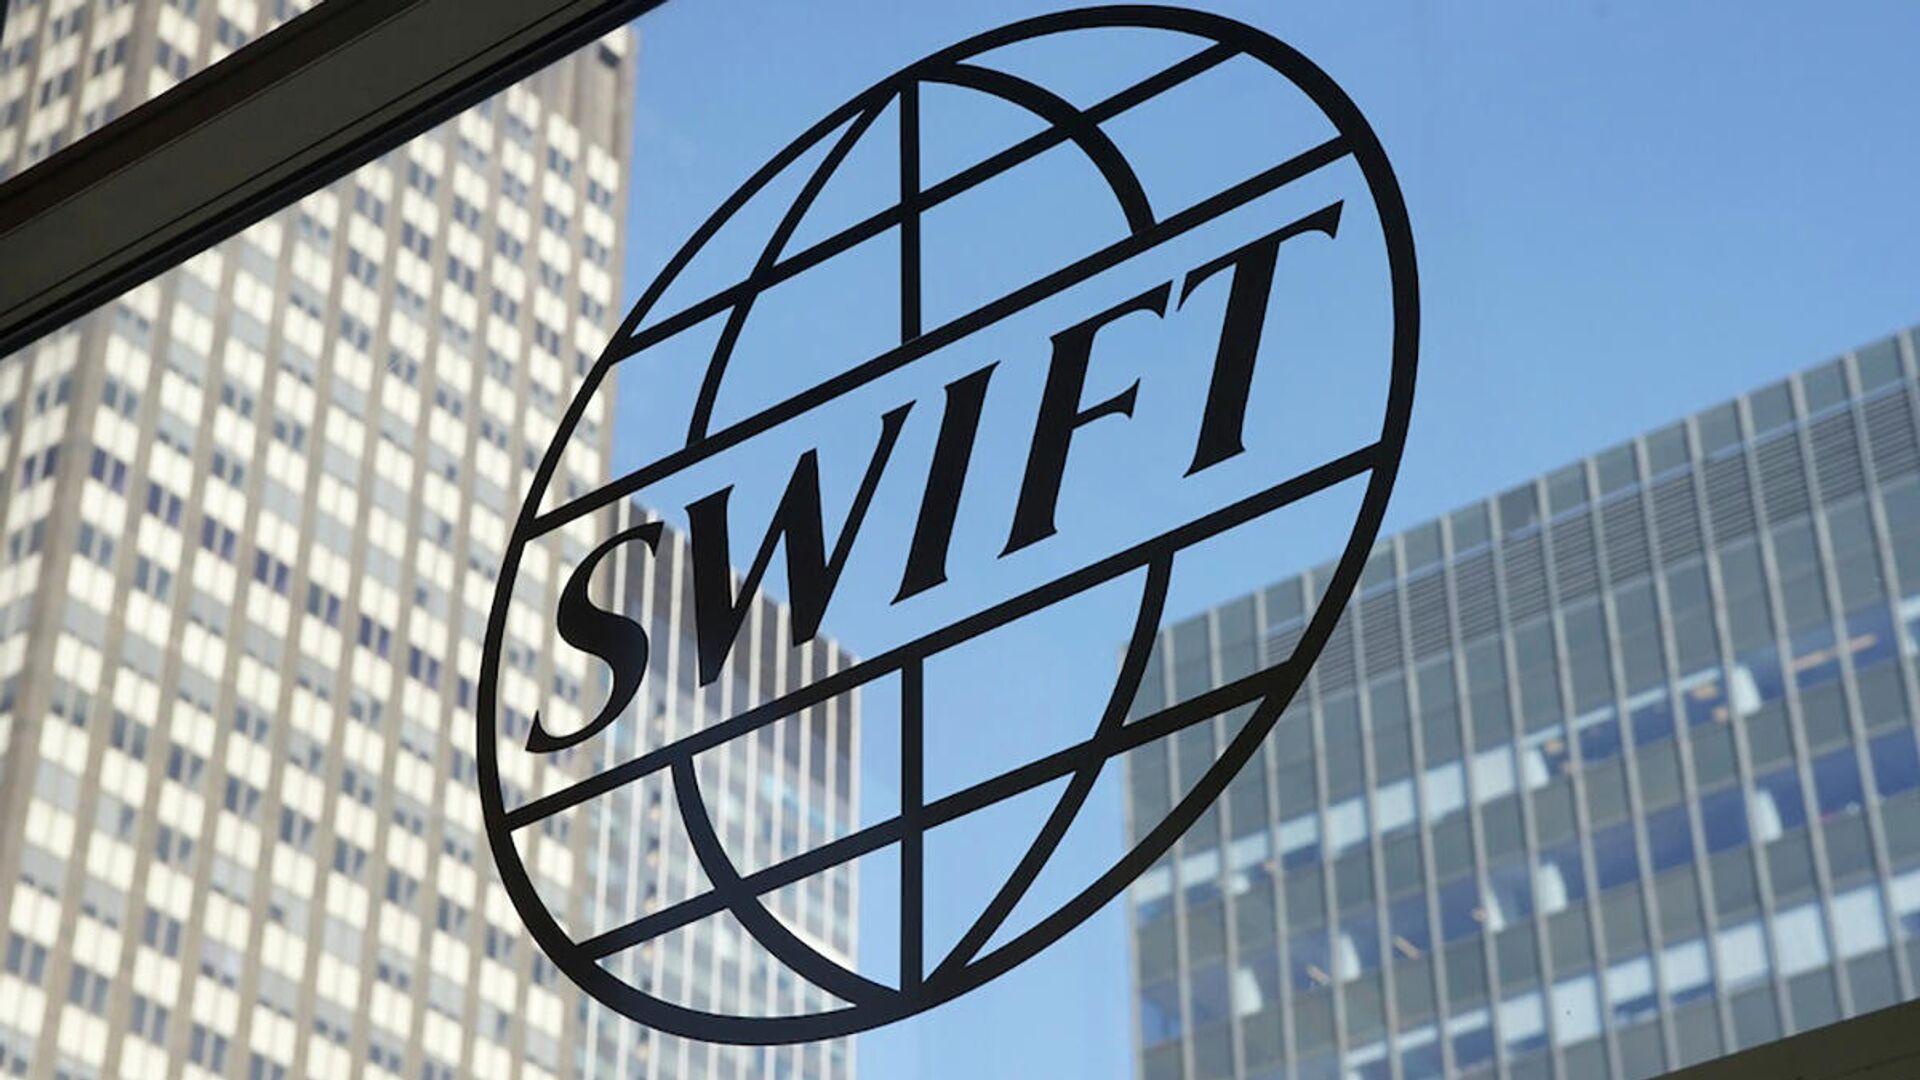 Логотип SWIFT - РИА Новости, 1920, 03.05.2021